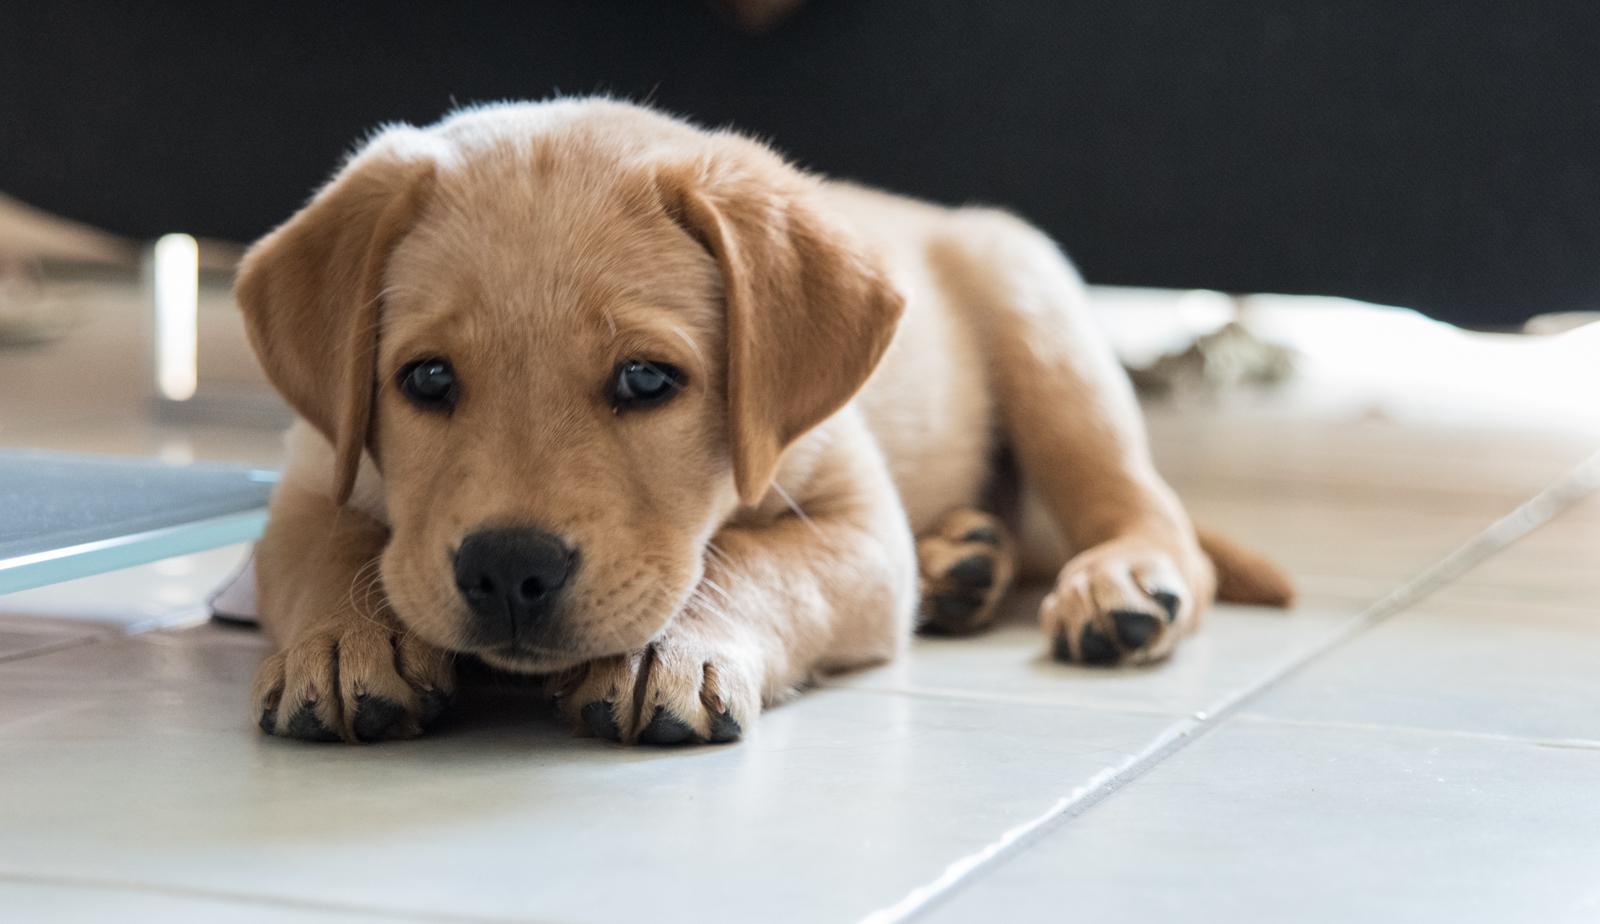 Tierfotograf-Labrador-Sven's Bildwerke-Hund-Hundefotografie19